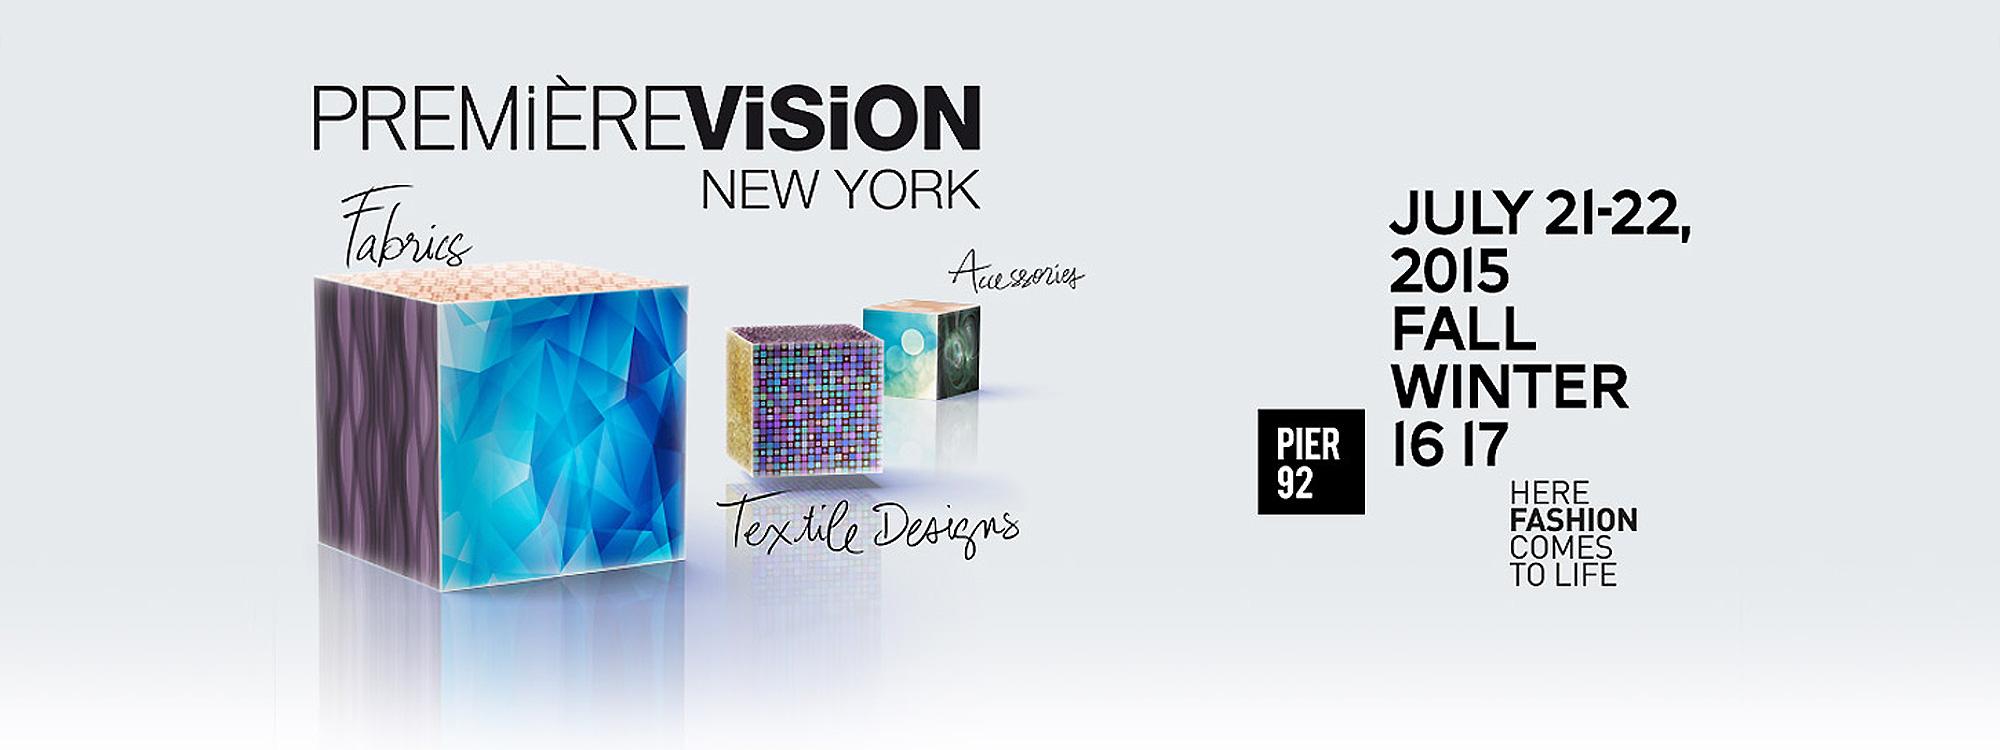 premiere-vision-new-york